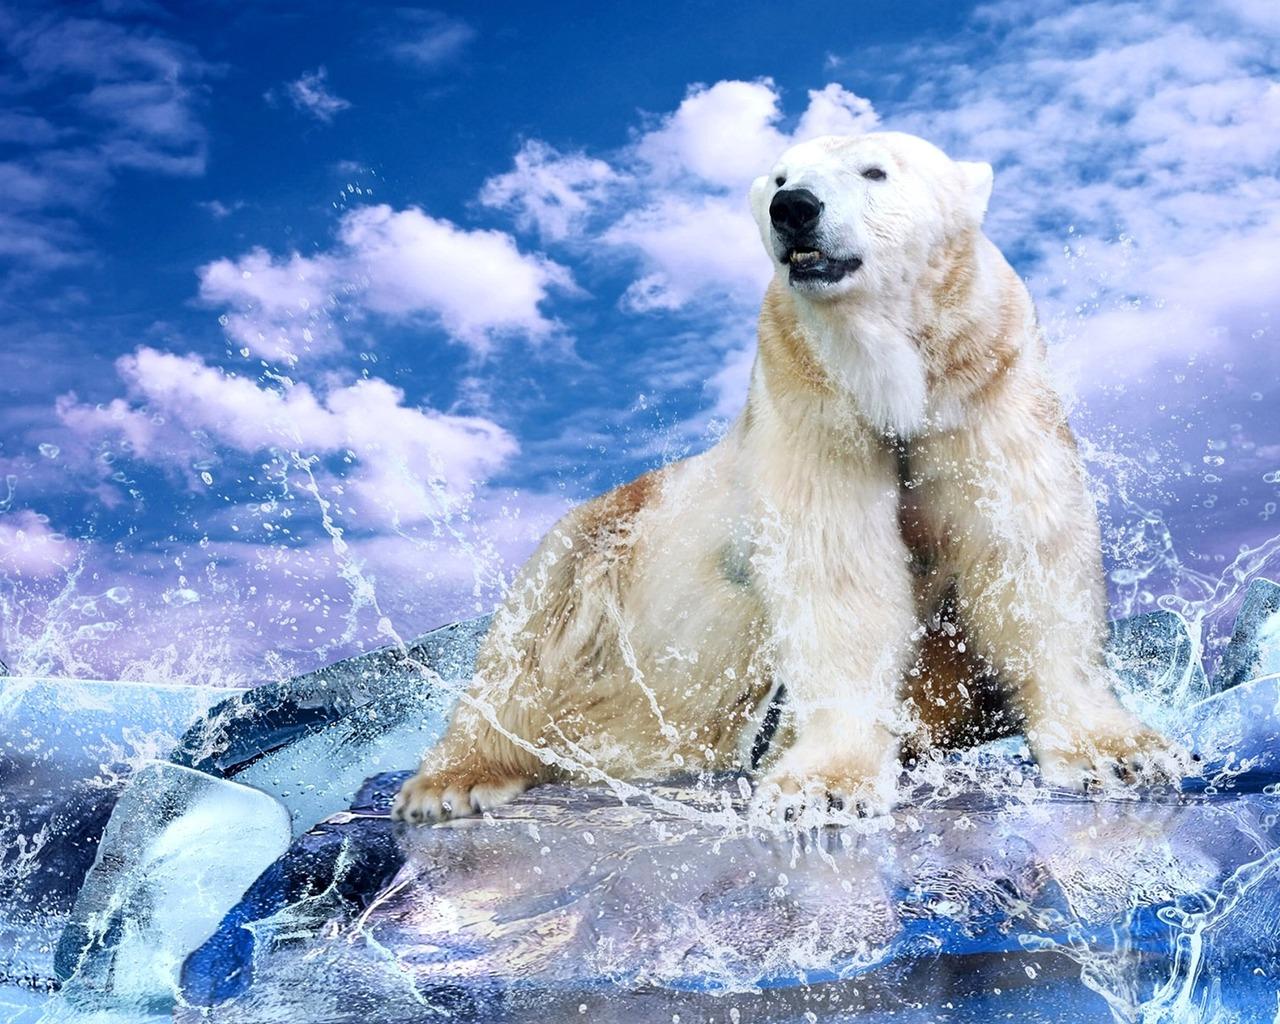 white polar bear, скачать фото, обои на рабочий стол